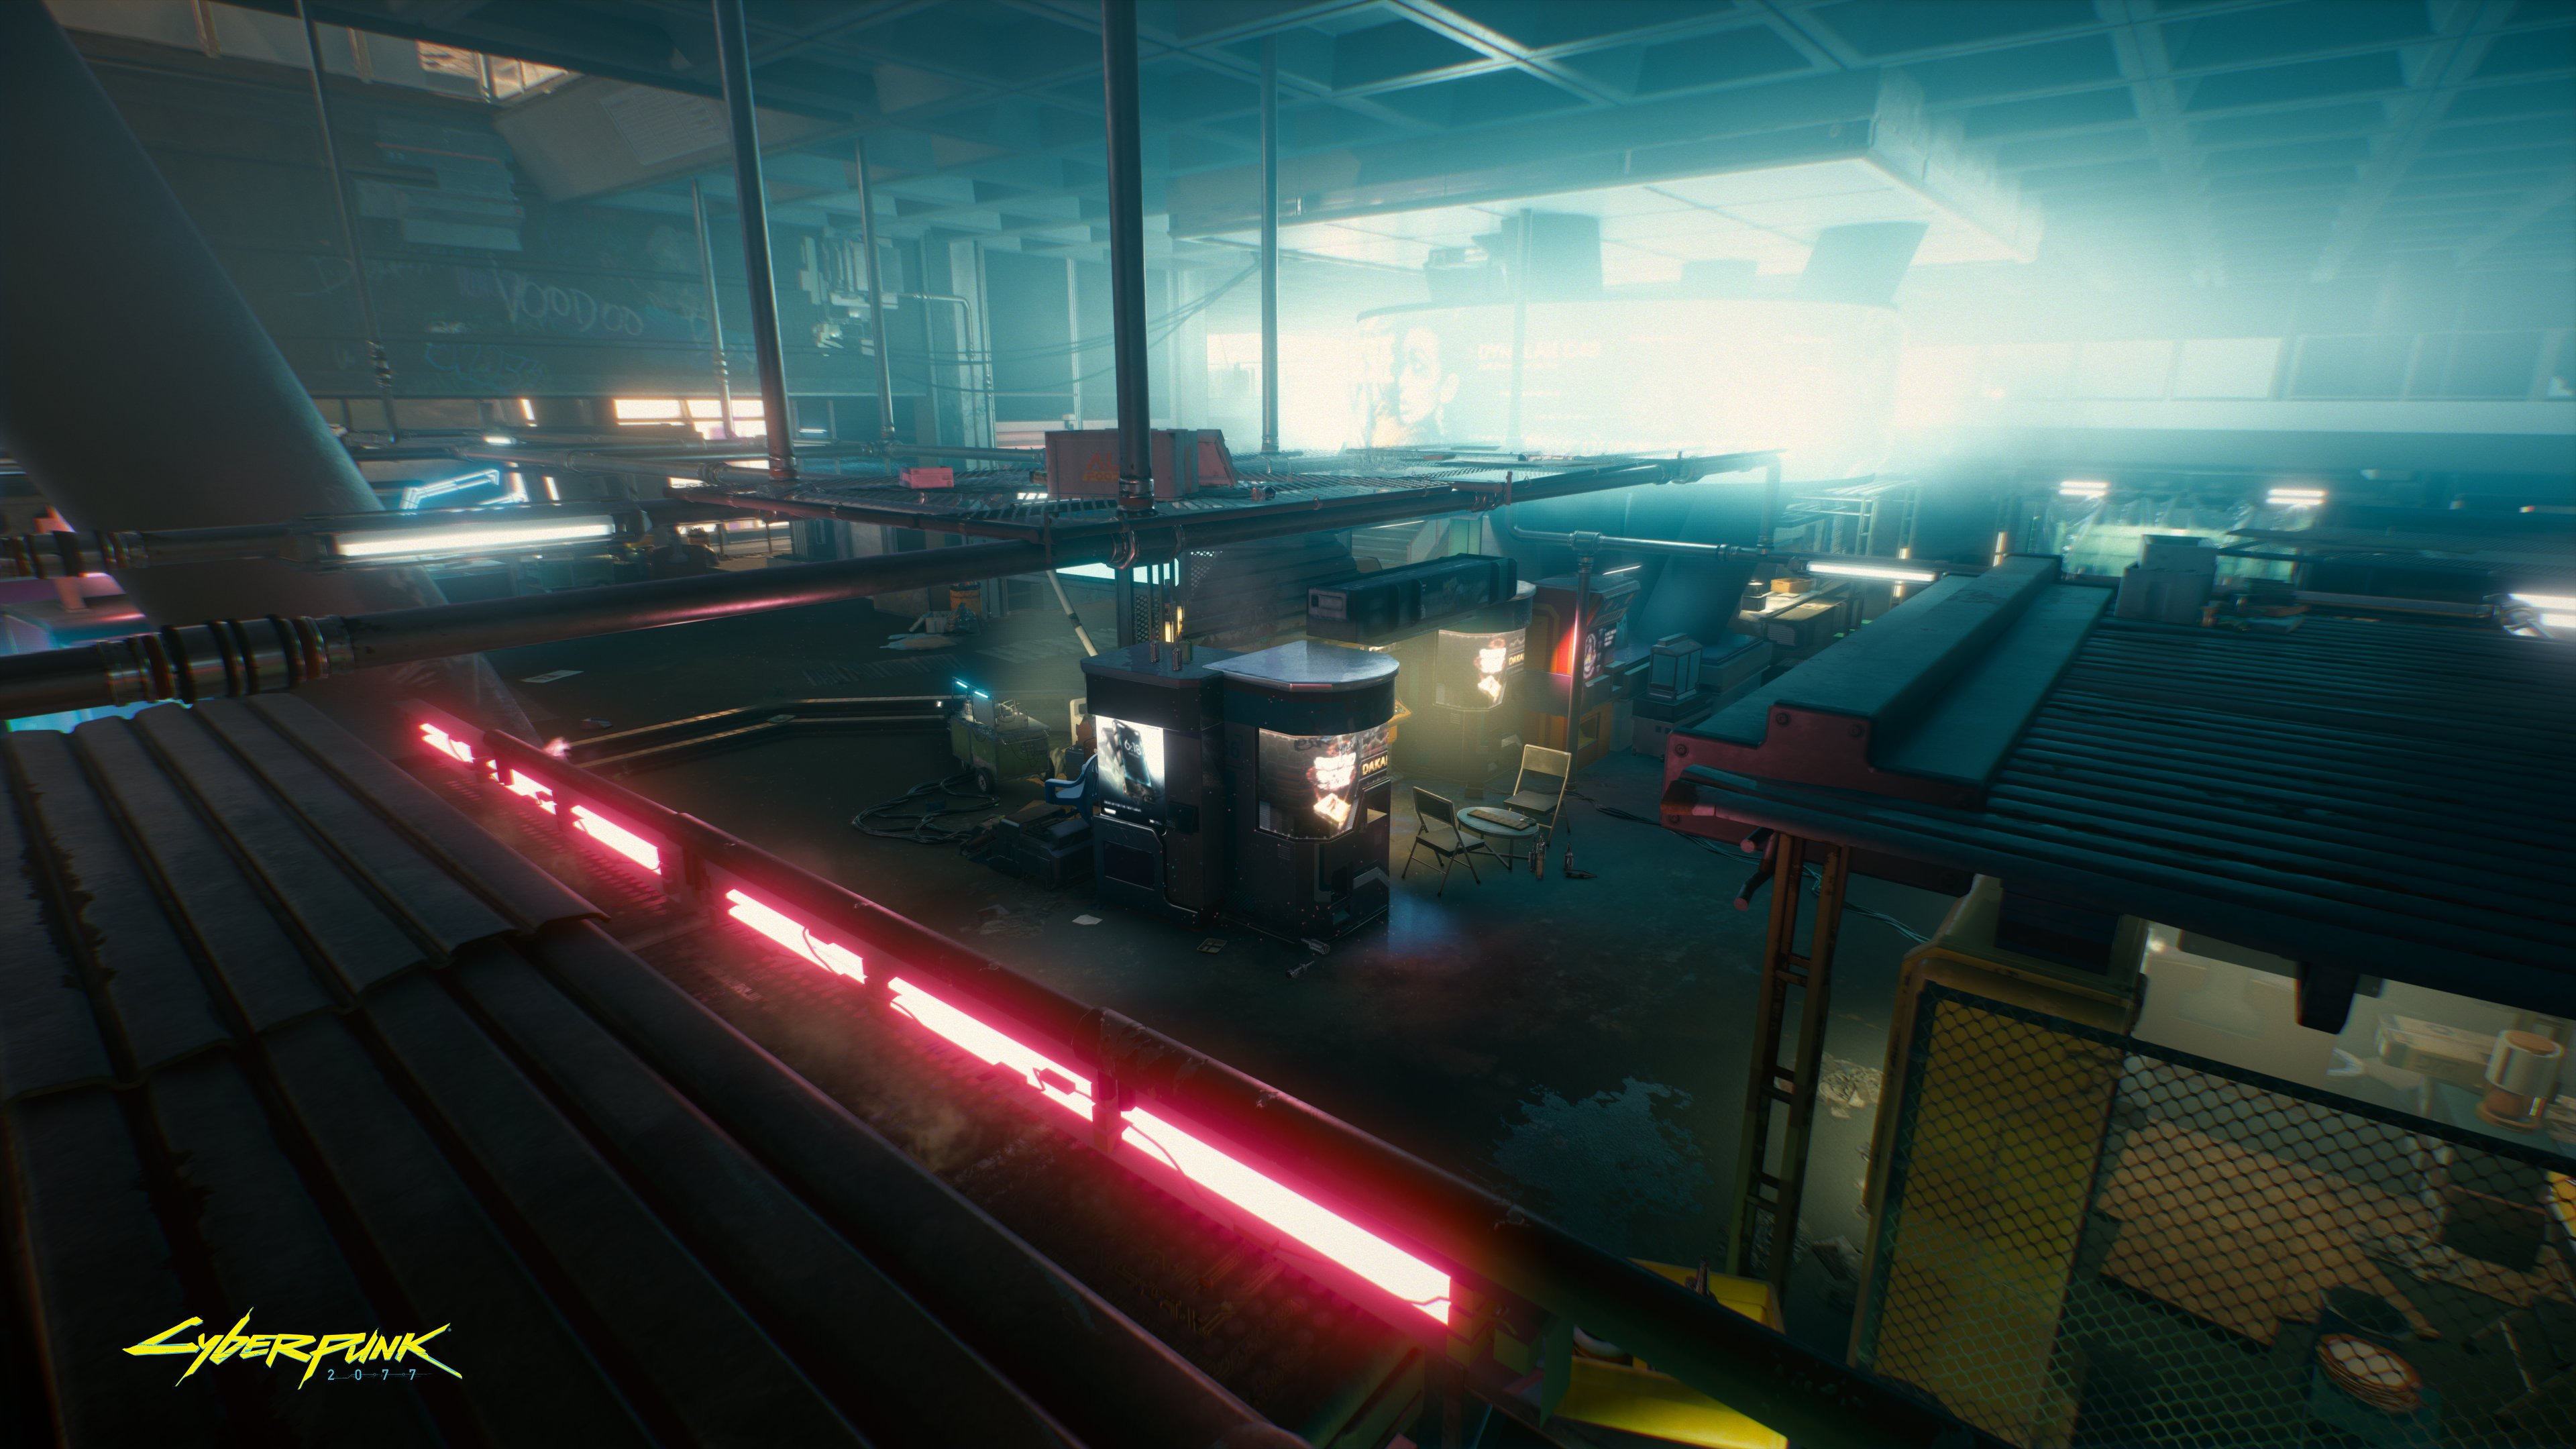 Байк и машина Ви на новых скриншотах Cyberpunk 2077